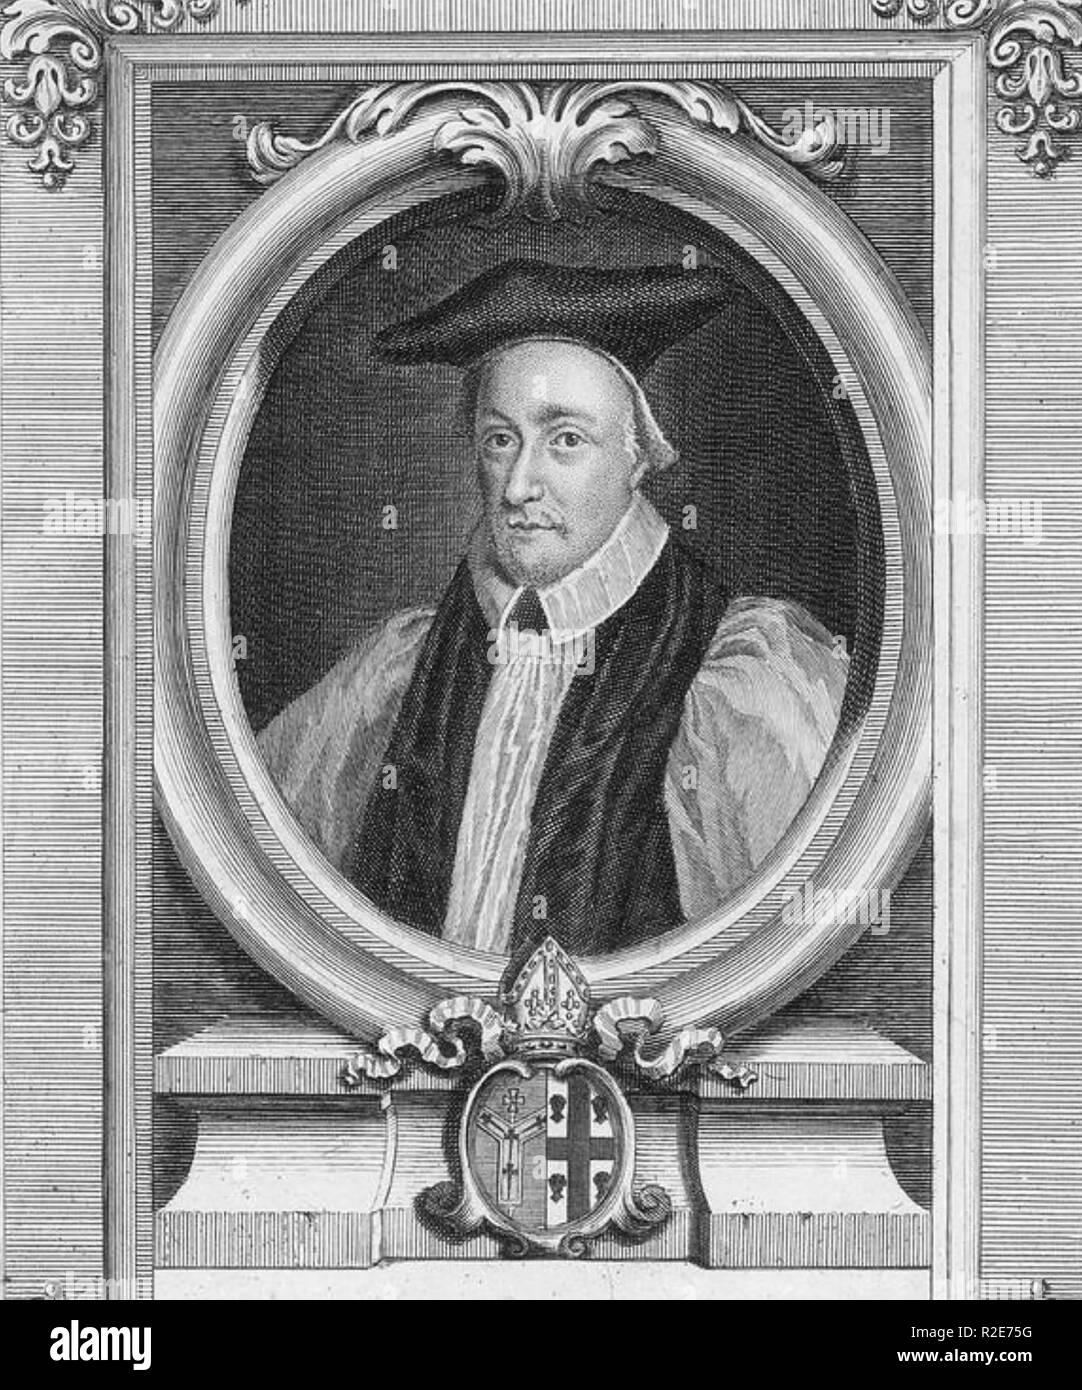 WILLIAM JUXTON (1582-1663) Archbishop of Canterbury - Stock Image